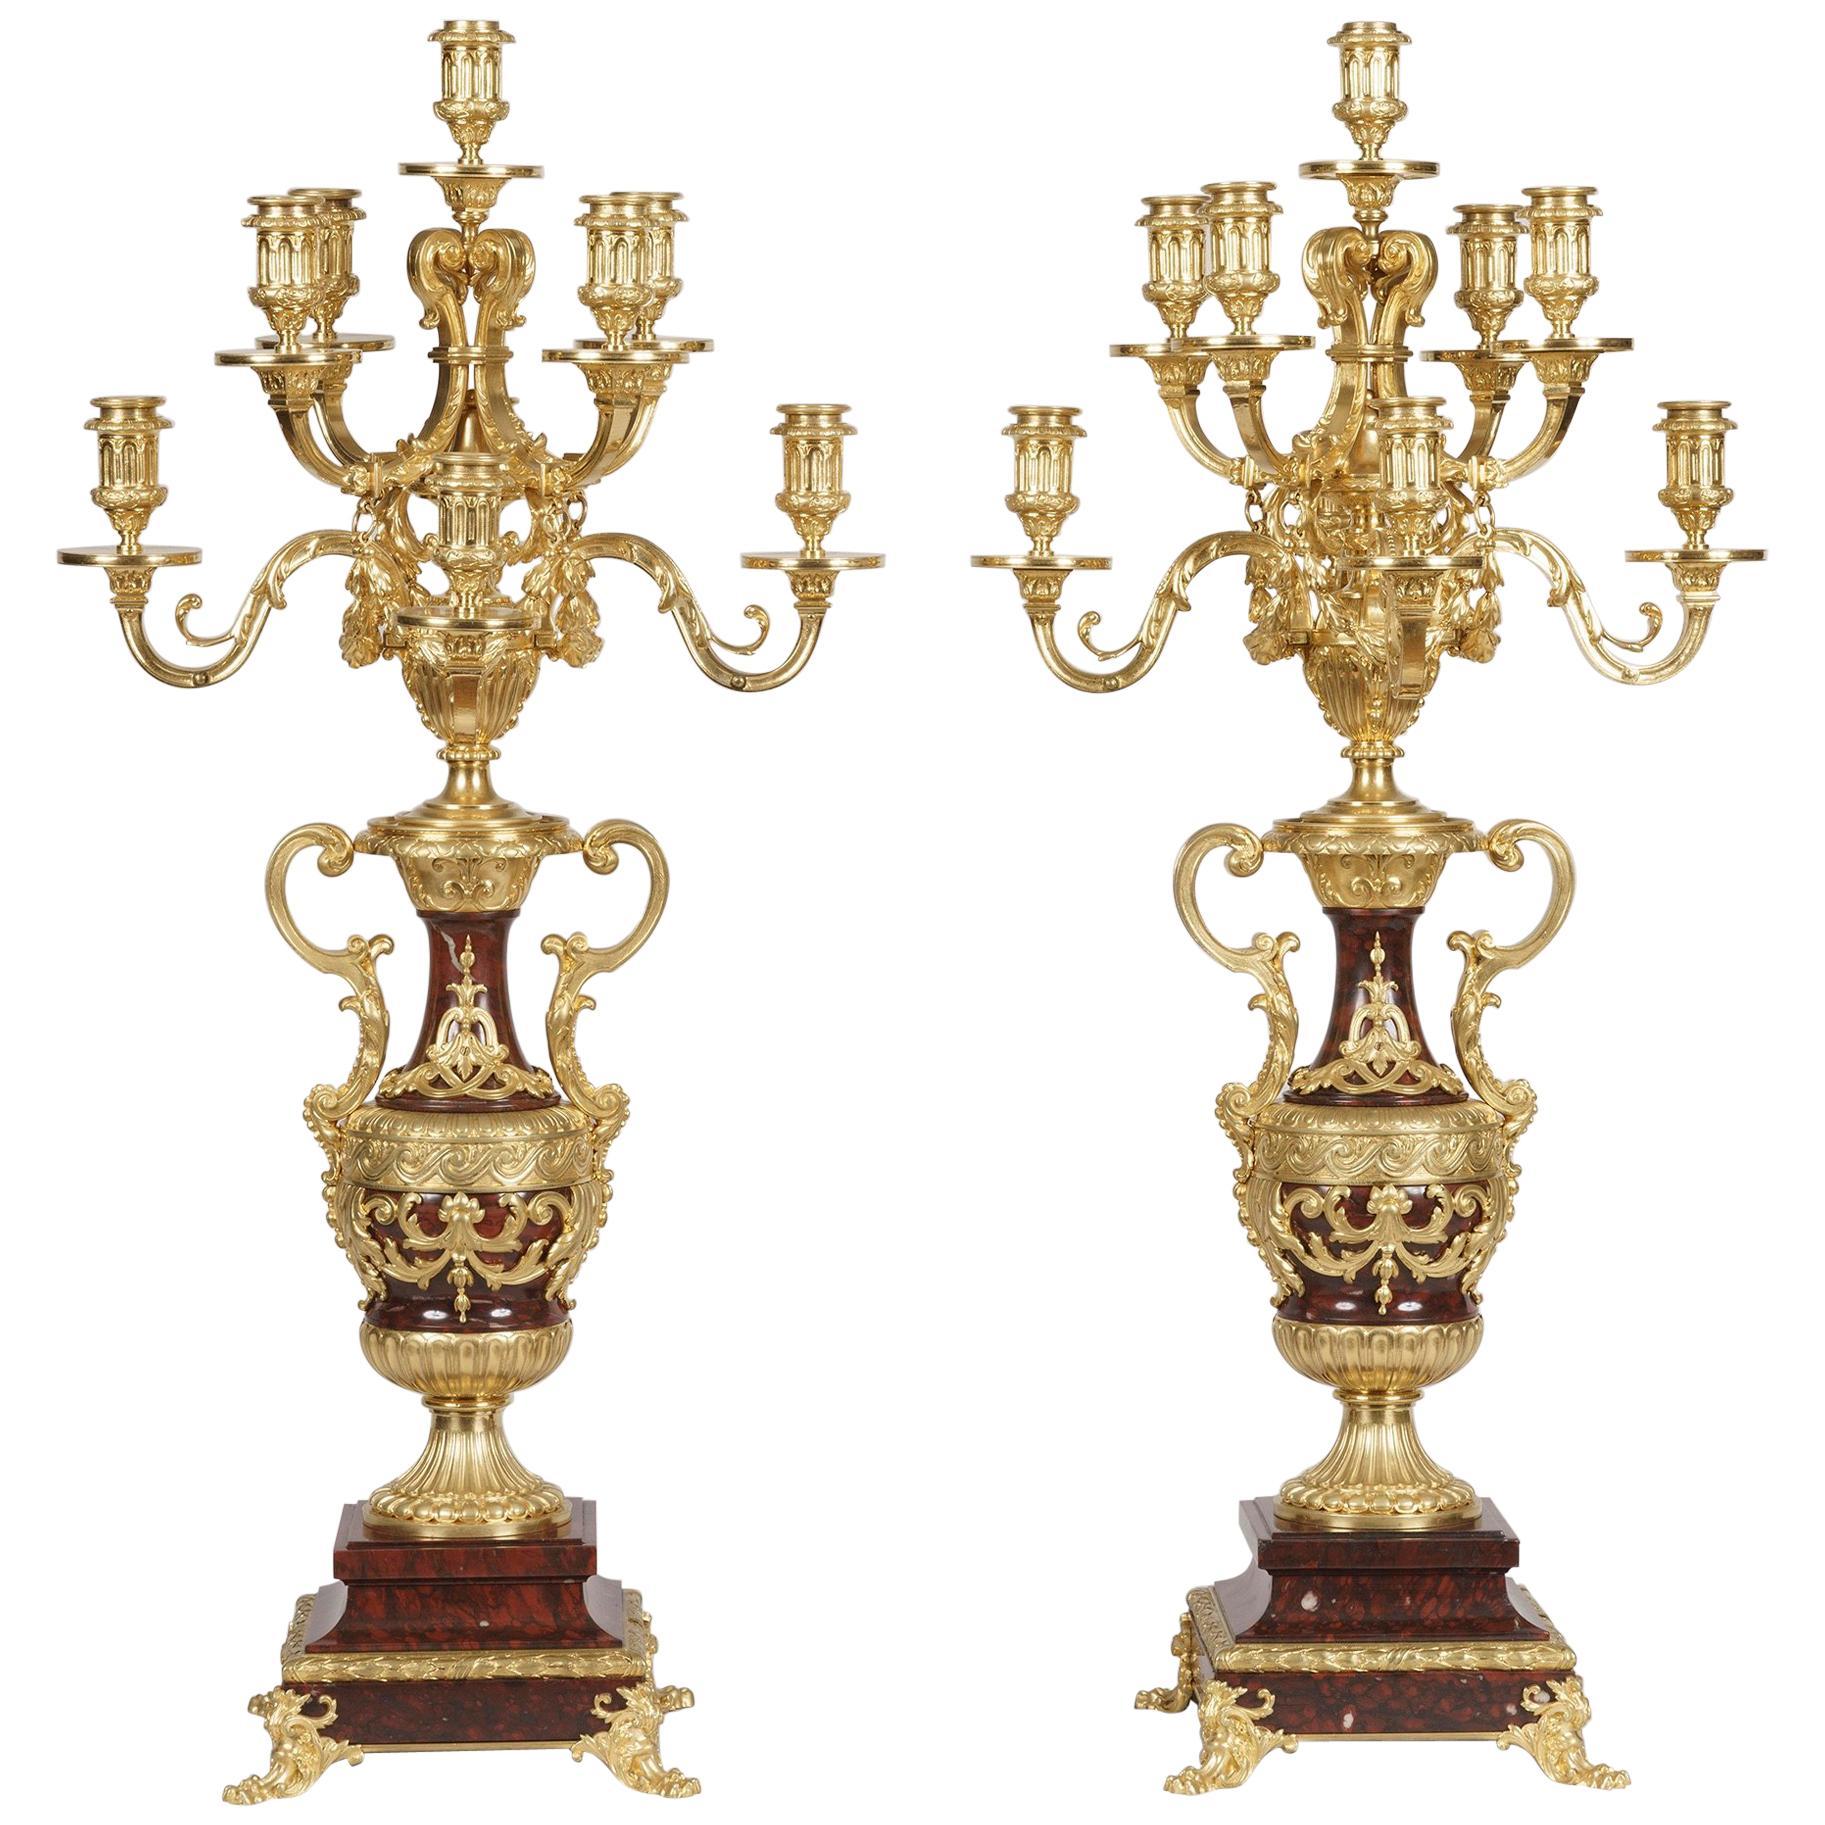 19th Century Pair of Louis XVI Style Candelabra